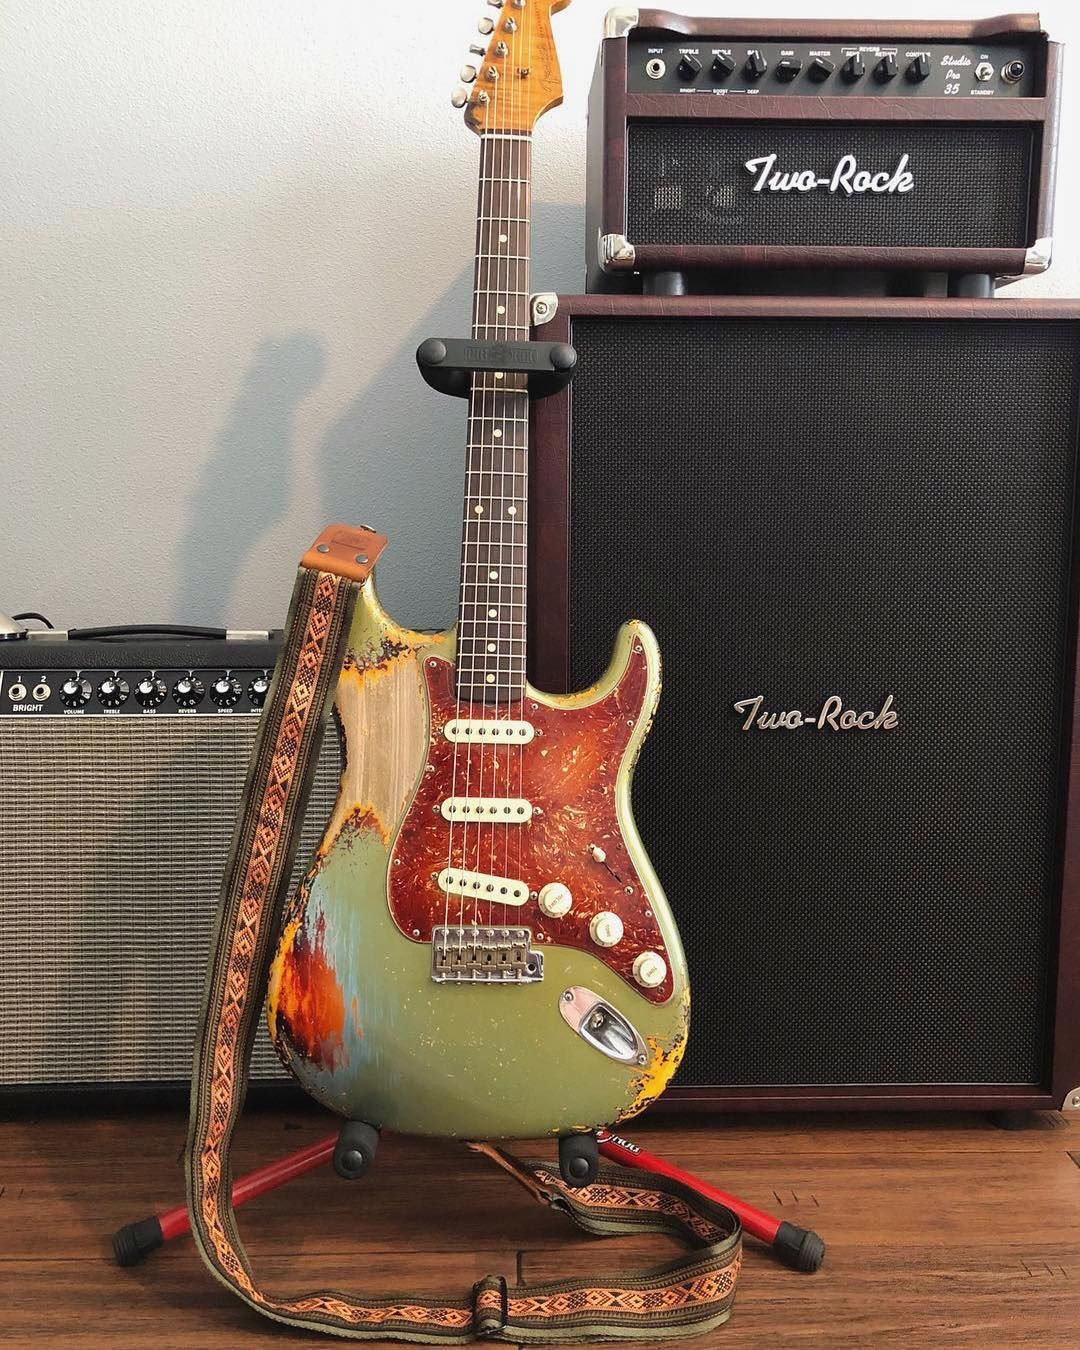 The 10 Best Stratocasters Our Pick Of The Best Strat Guitars >> La Imagen Puede Contener Guitarra Instrumentos In 2019 Fender